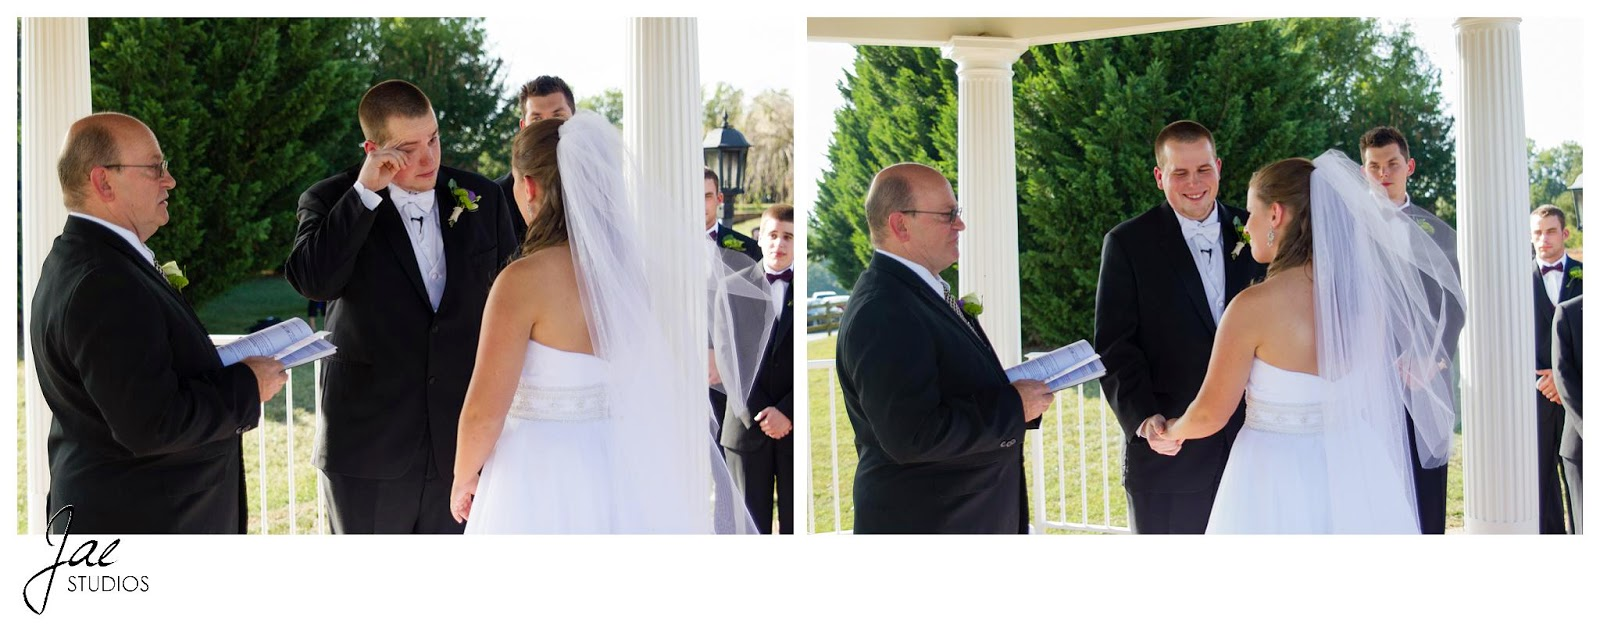 Jonathan and Julie, Bird cage, West Manor Estate, Wedding, Lynchburg, Virginia, Jae Studios, ceremony, crying, pastor, bride, groom, groomsmen, veil, wedding dress outdoors